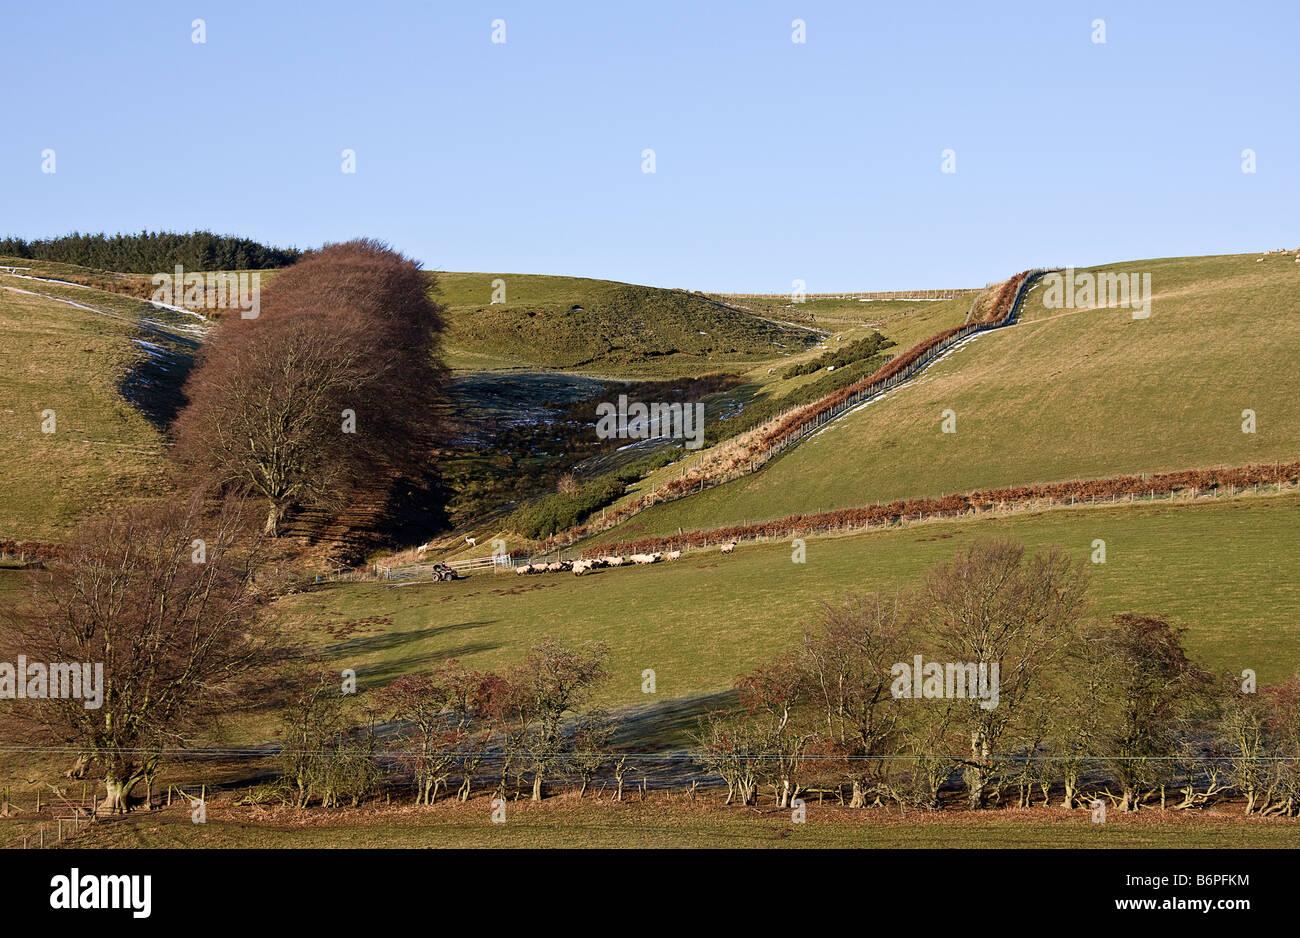 A pastoral landscape in the Scottish Borders. - Stock Image